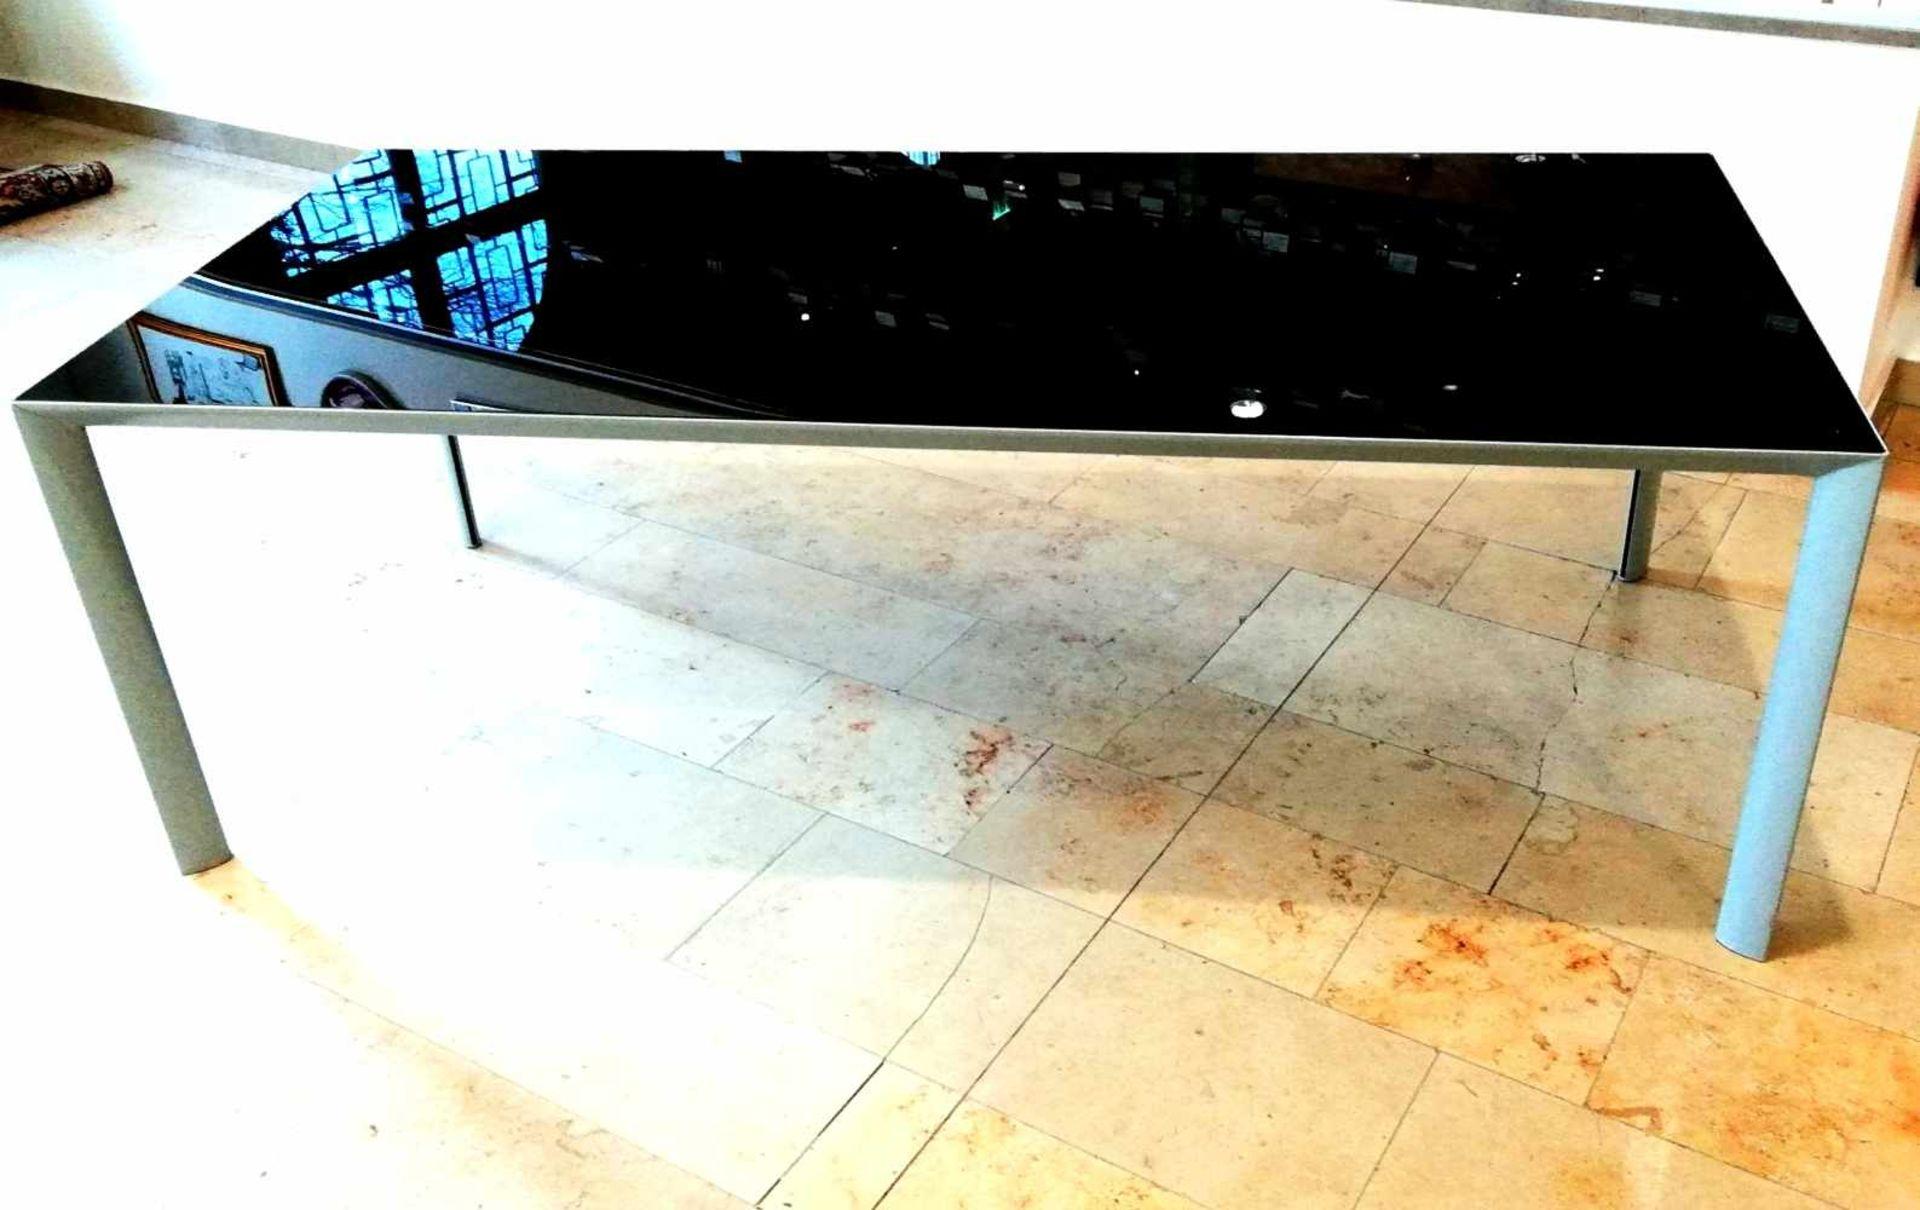 Los 31 - Moderner Design-Glastisch, Marke PORROgraues Stahlgestell 220x100x75 cm, neuwertig;